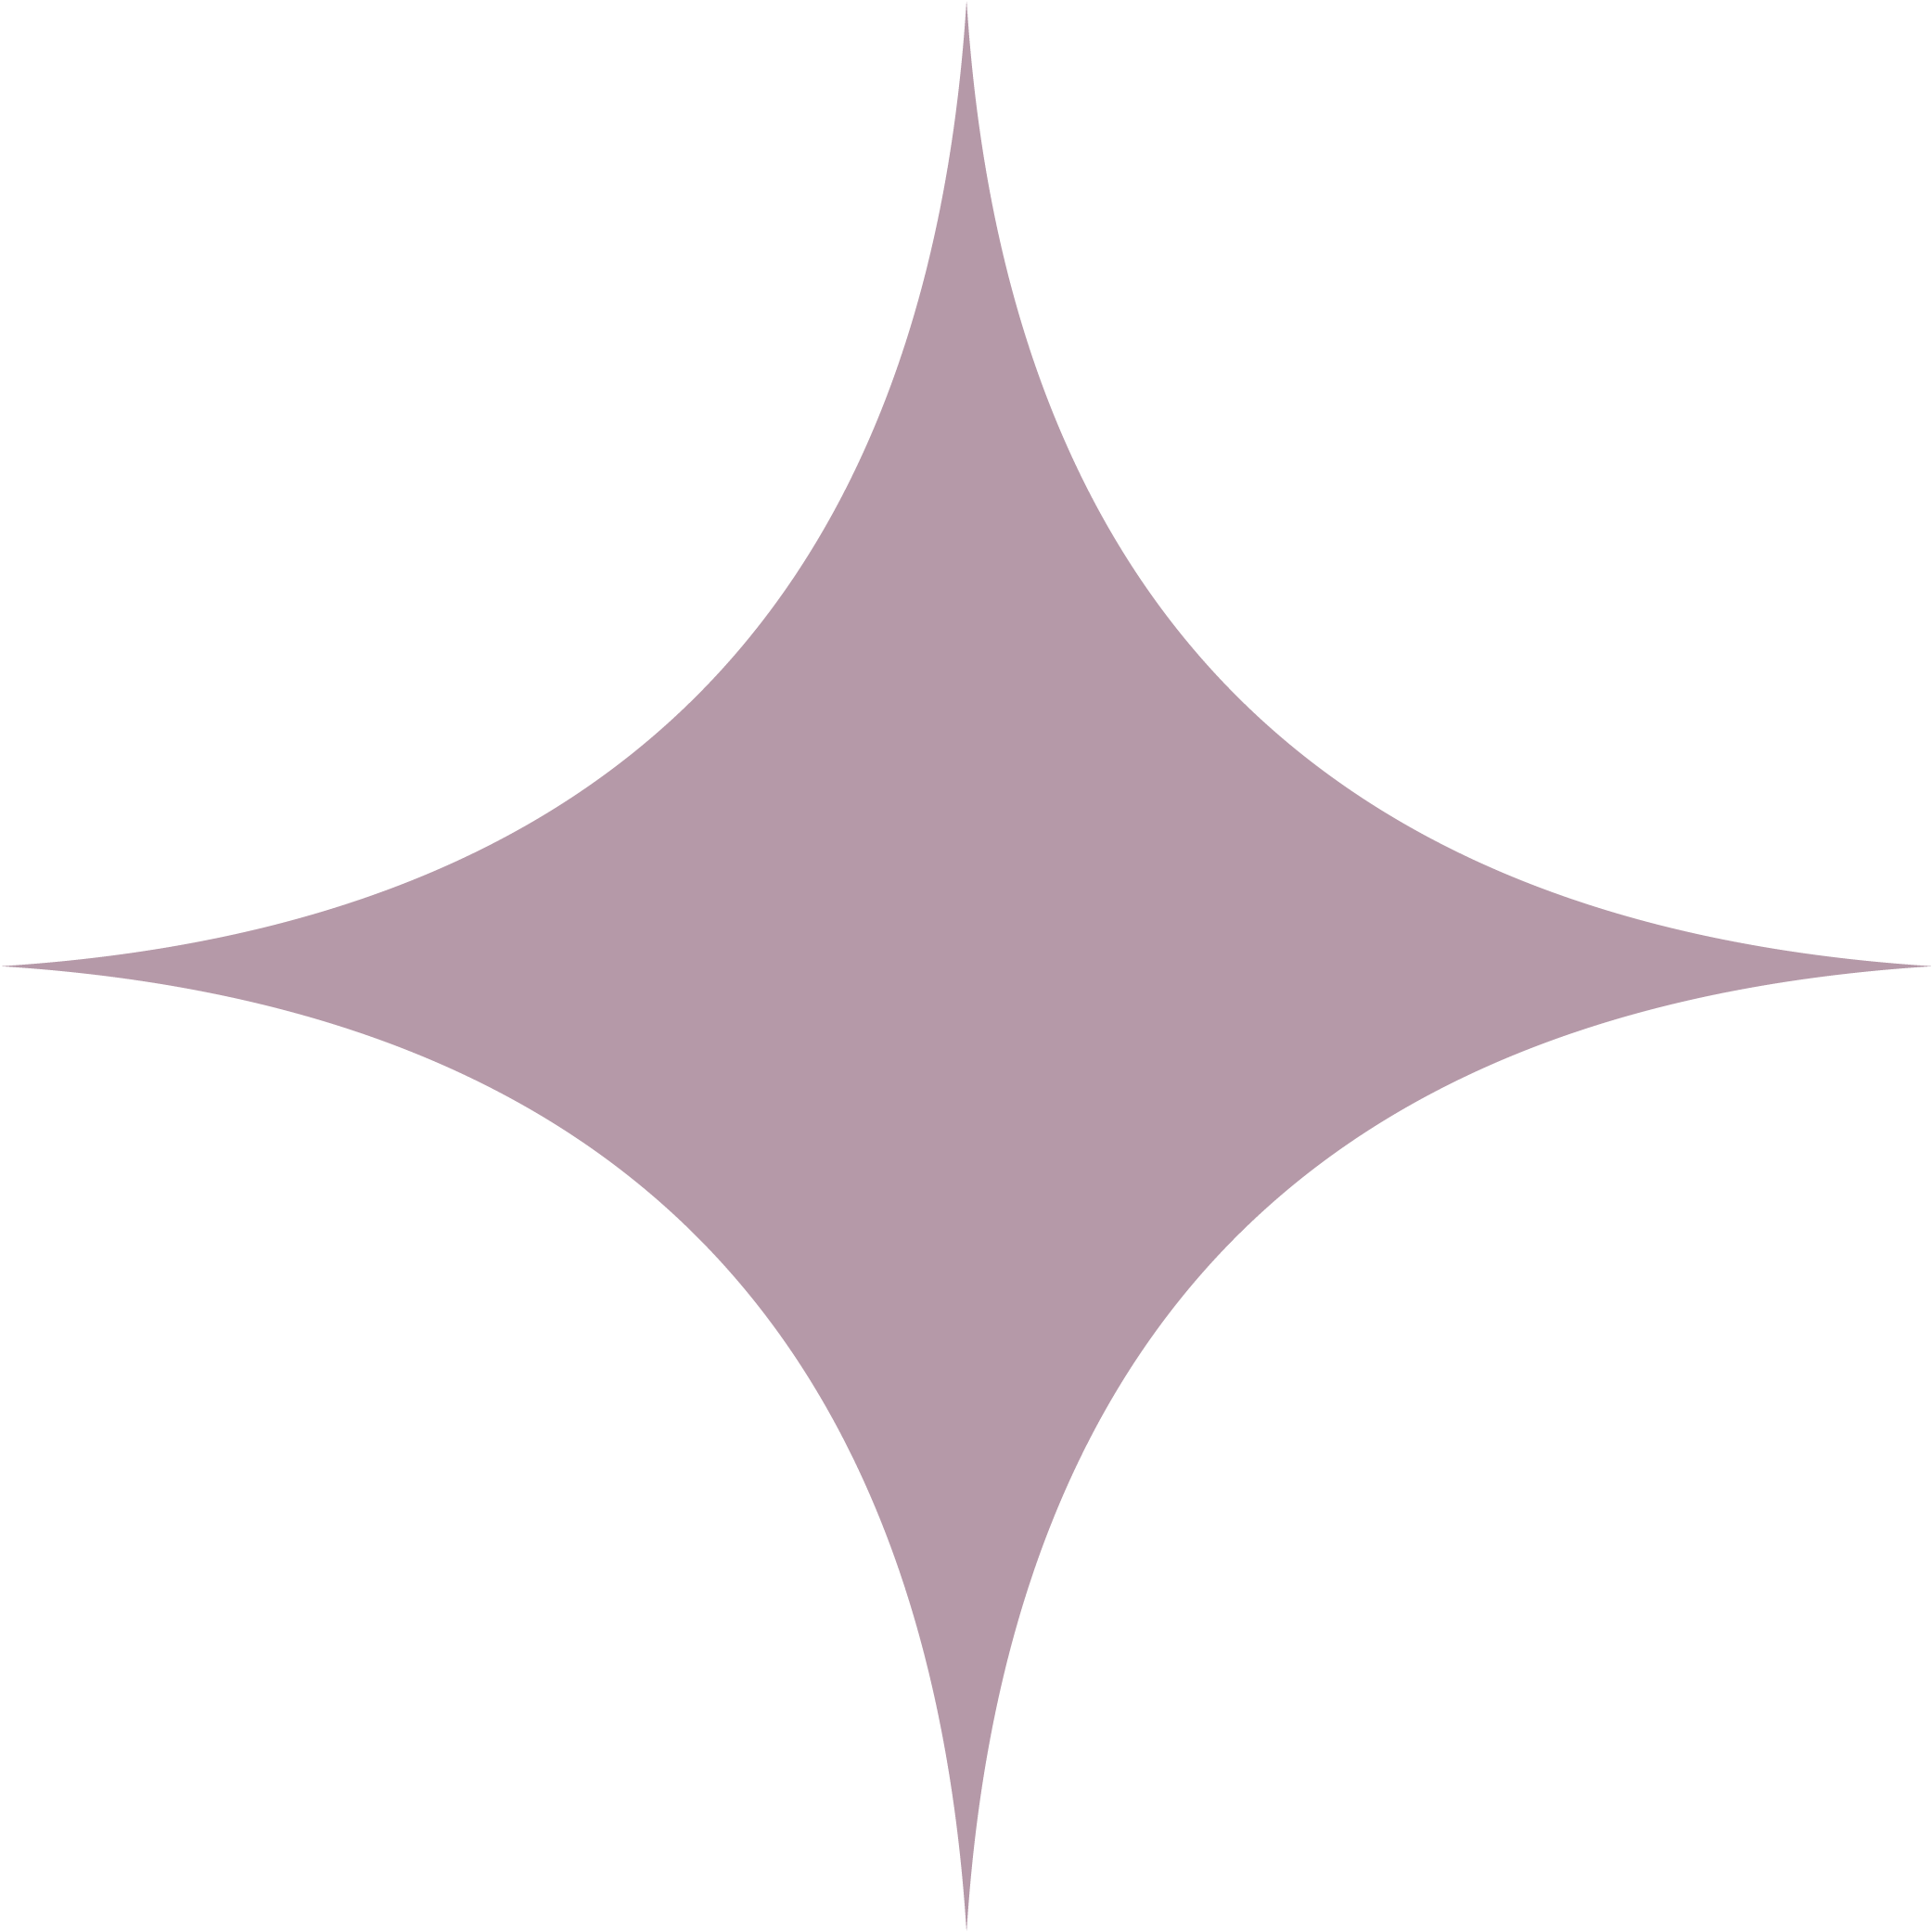 SFU003_SparkElement_Purple_CMYK.png